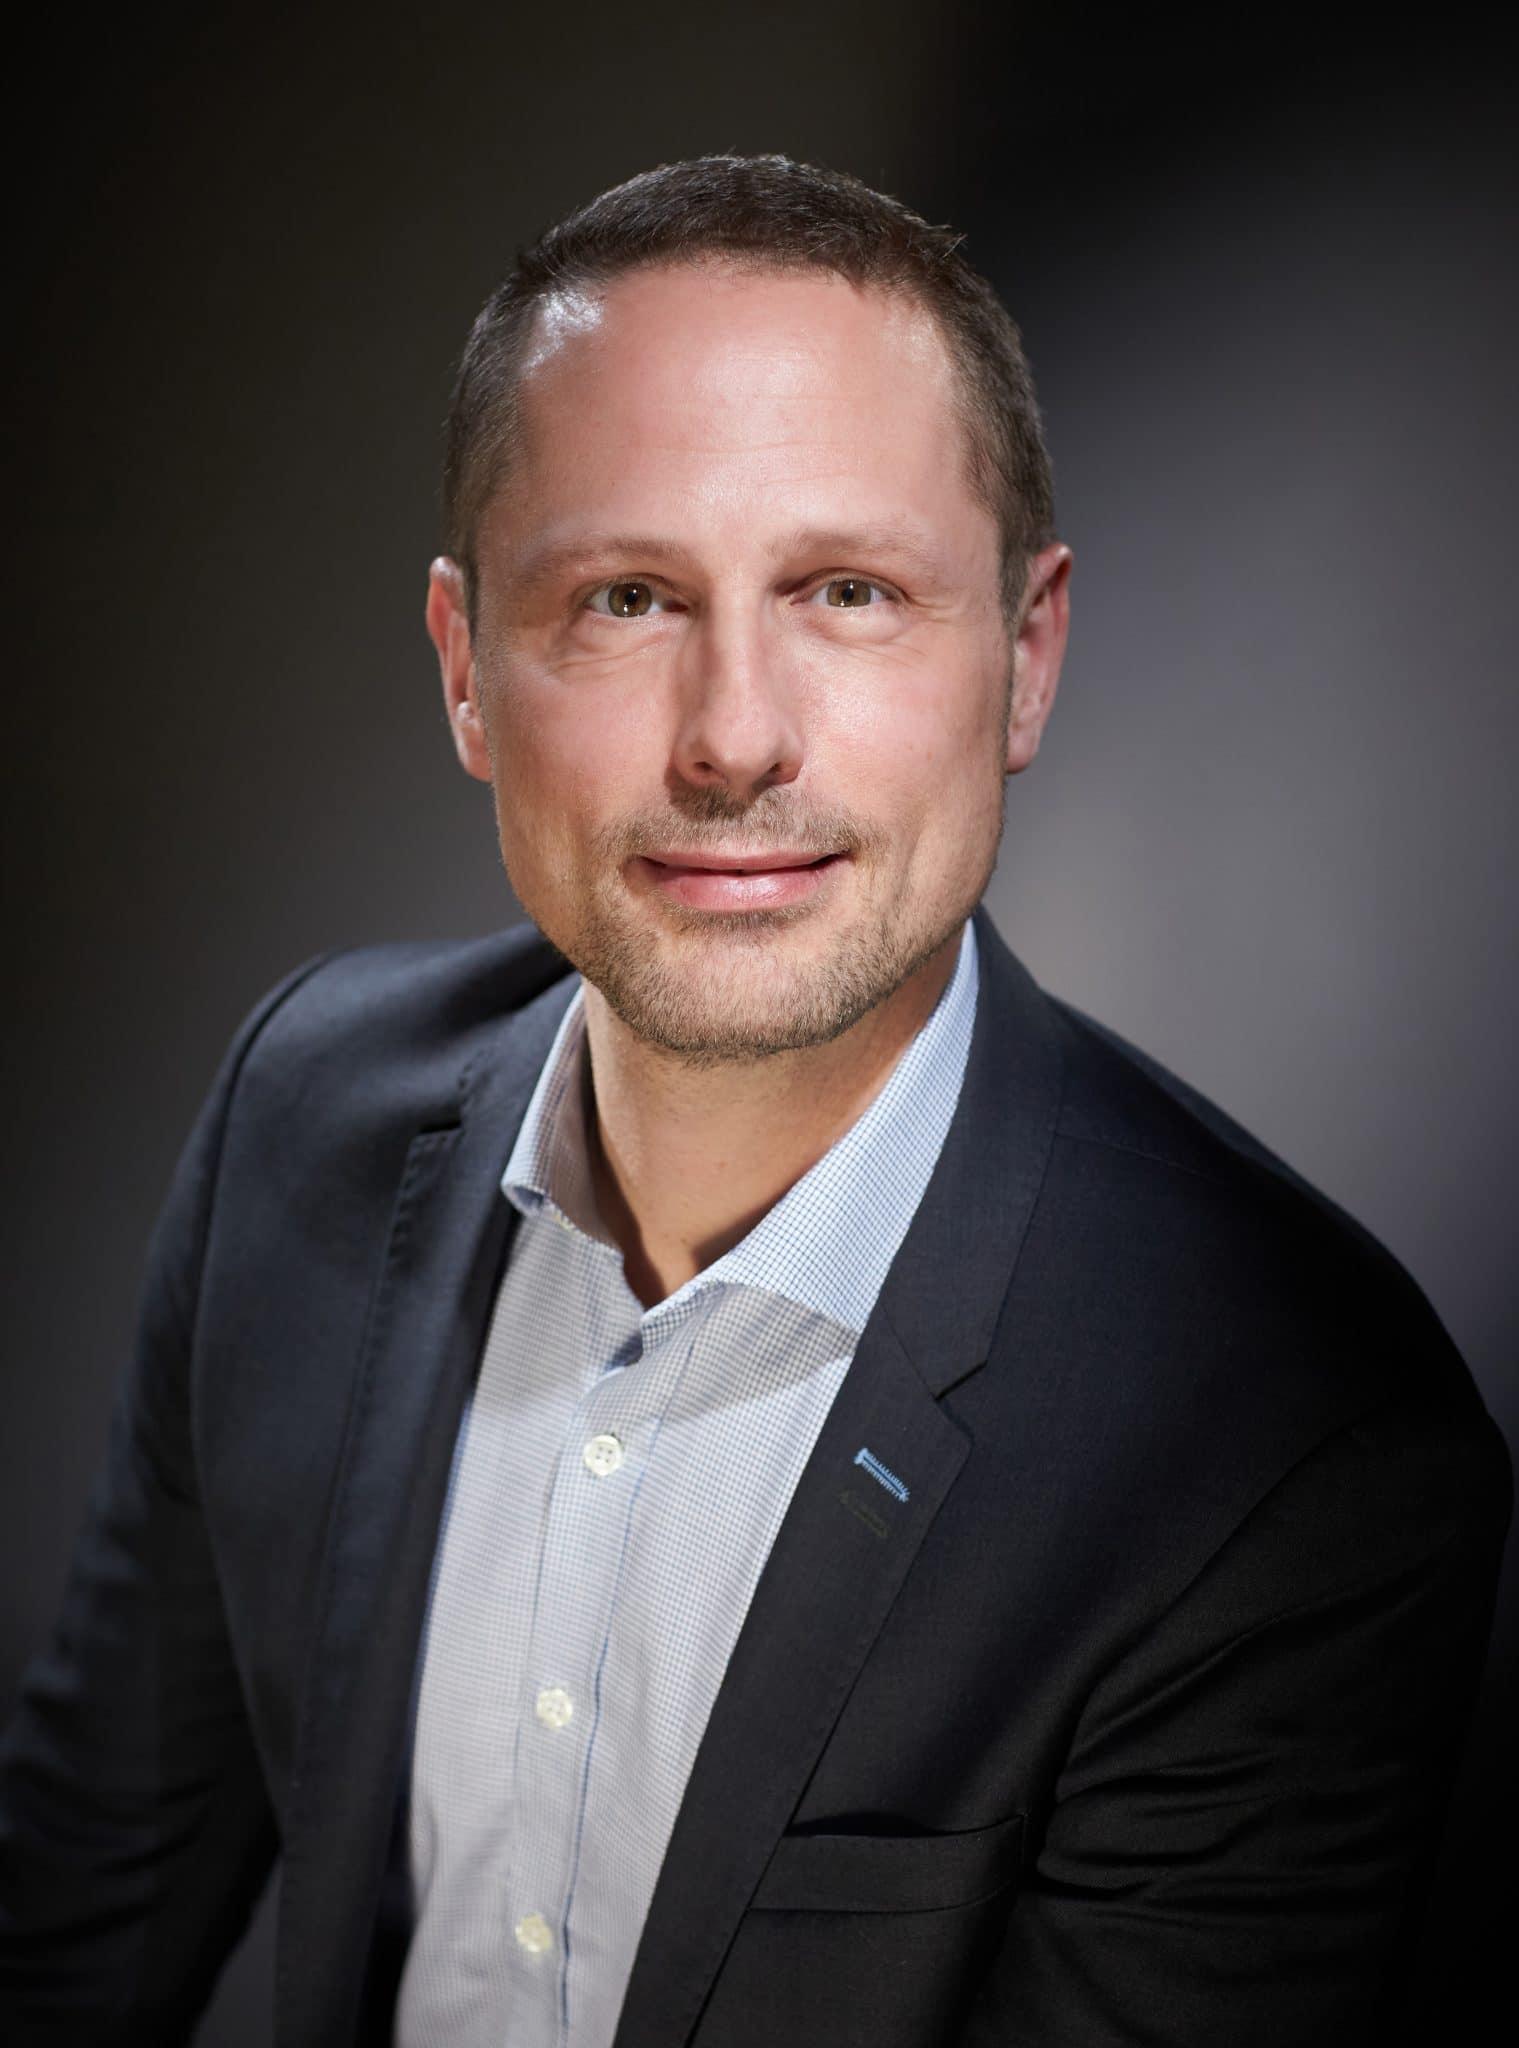 Jean-Christophe Godet